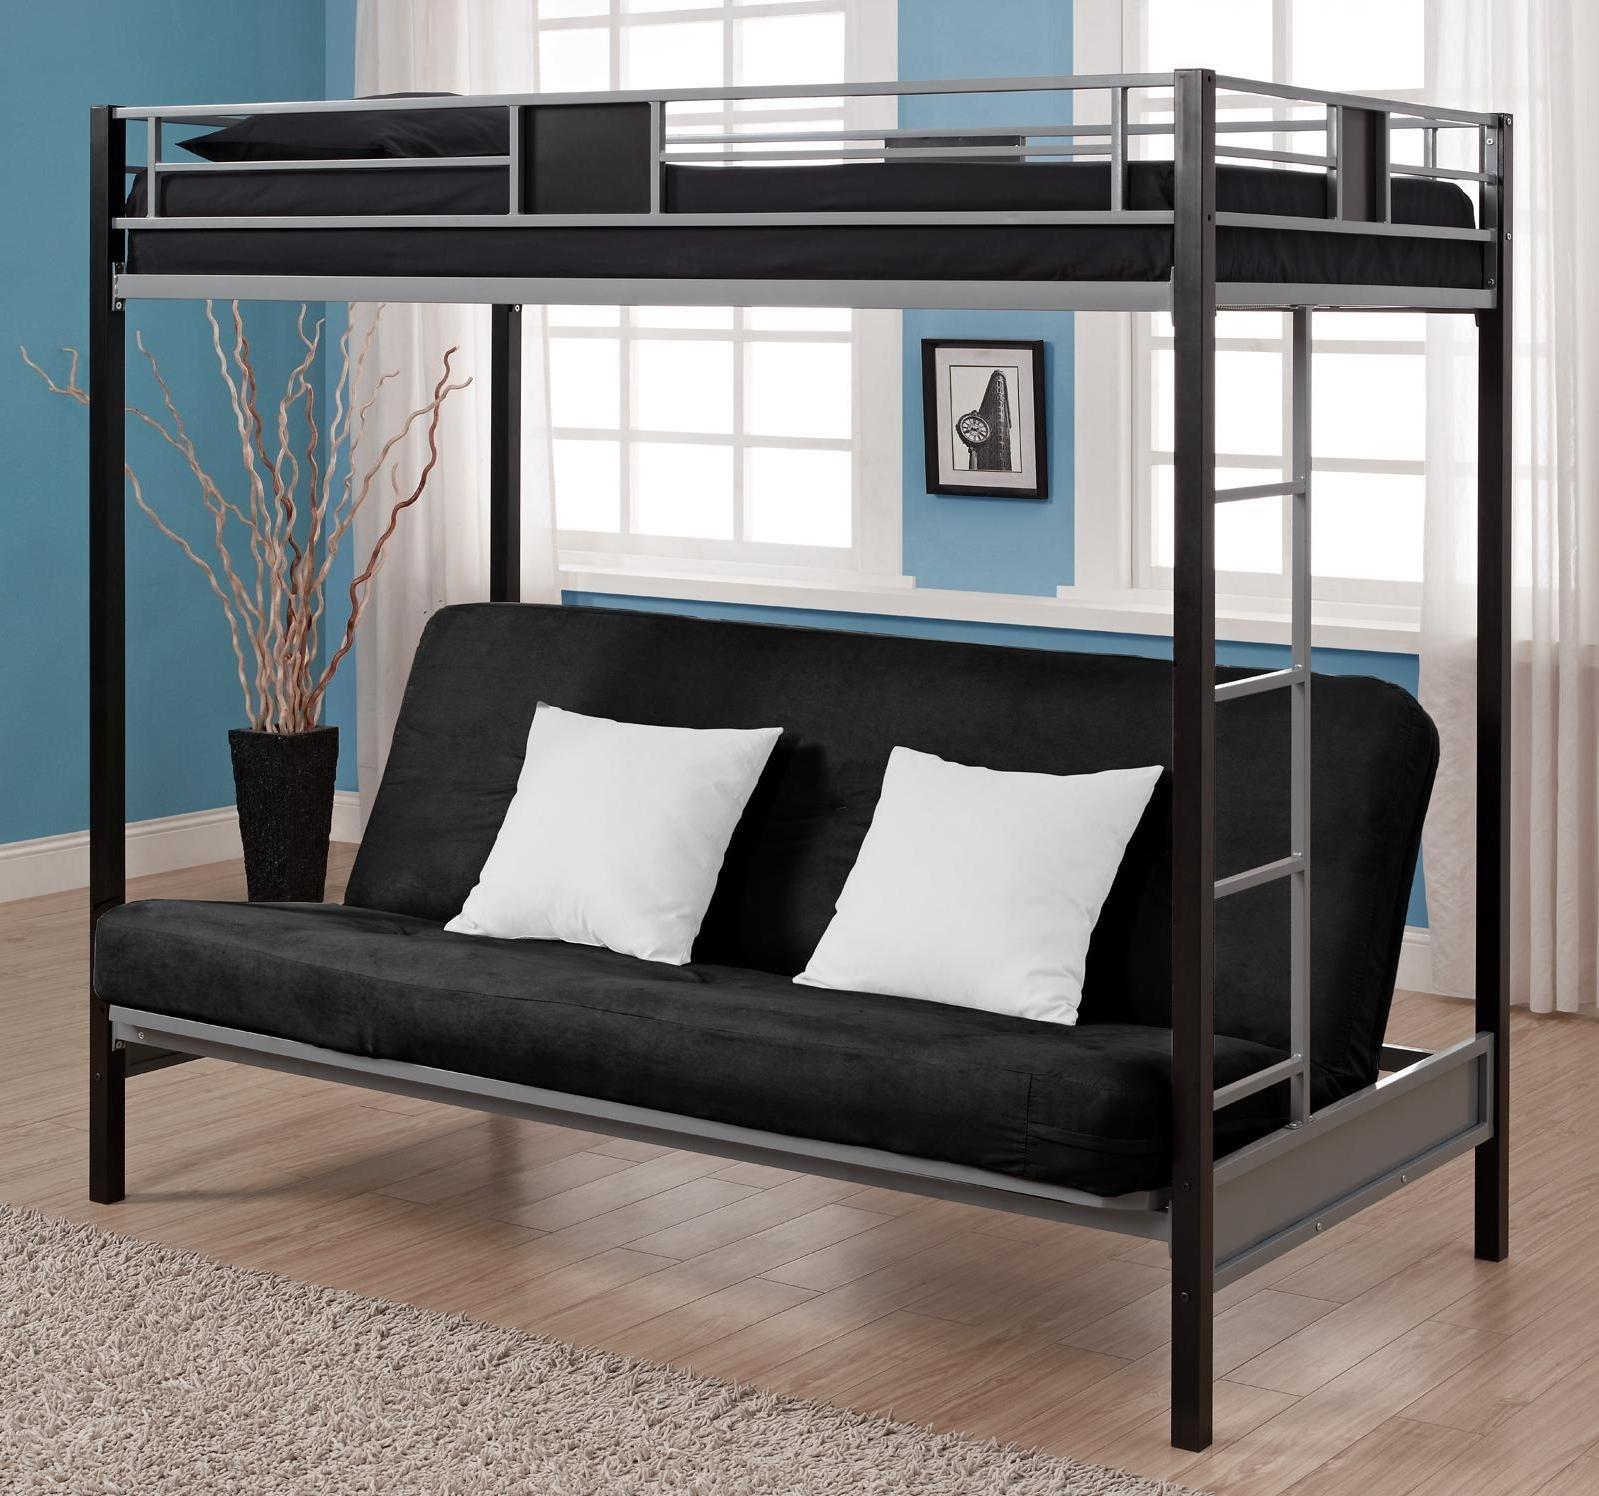 Bunk Bed With Sofa Bed – Interior Design Ideas Bedroom – Imagepoop With Regard To Favorite Sofa Bunk Beds (View 9 of 15)